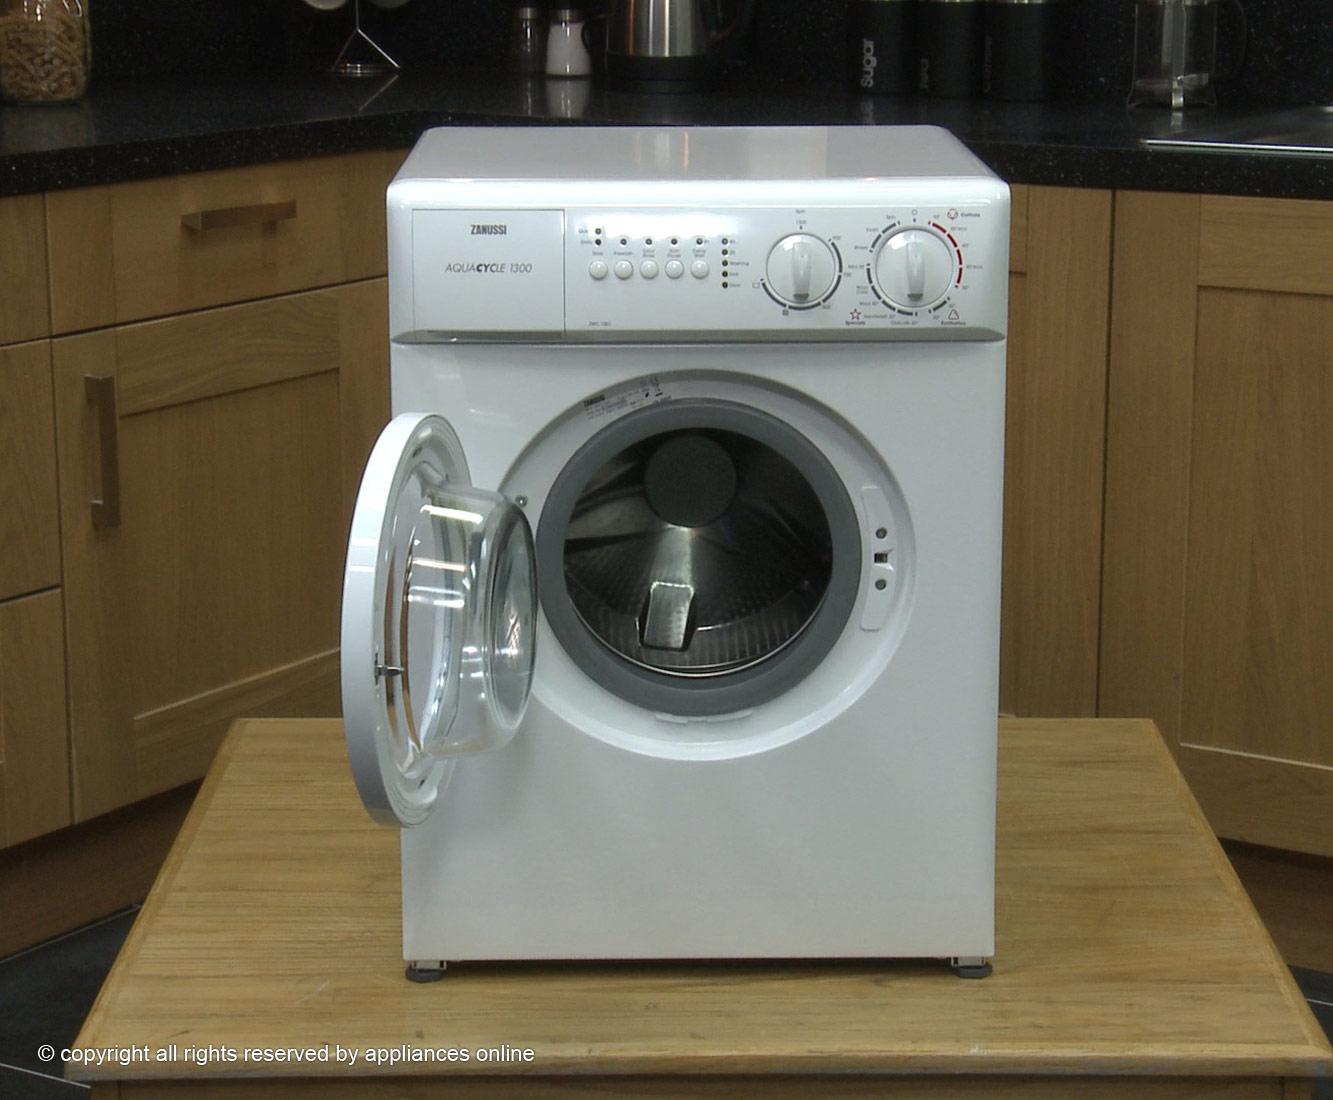 Boots Kitchen Appliances | Washing Machines, Fridges & More on Washing Machine  id=12234